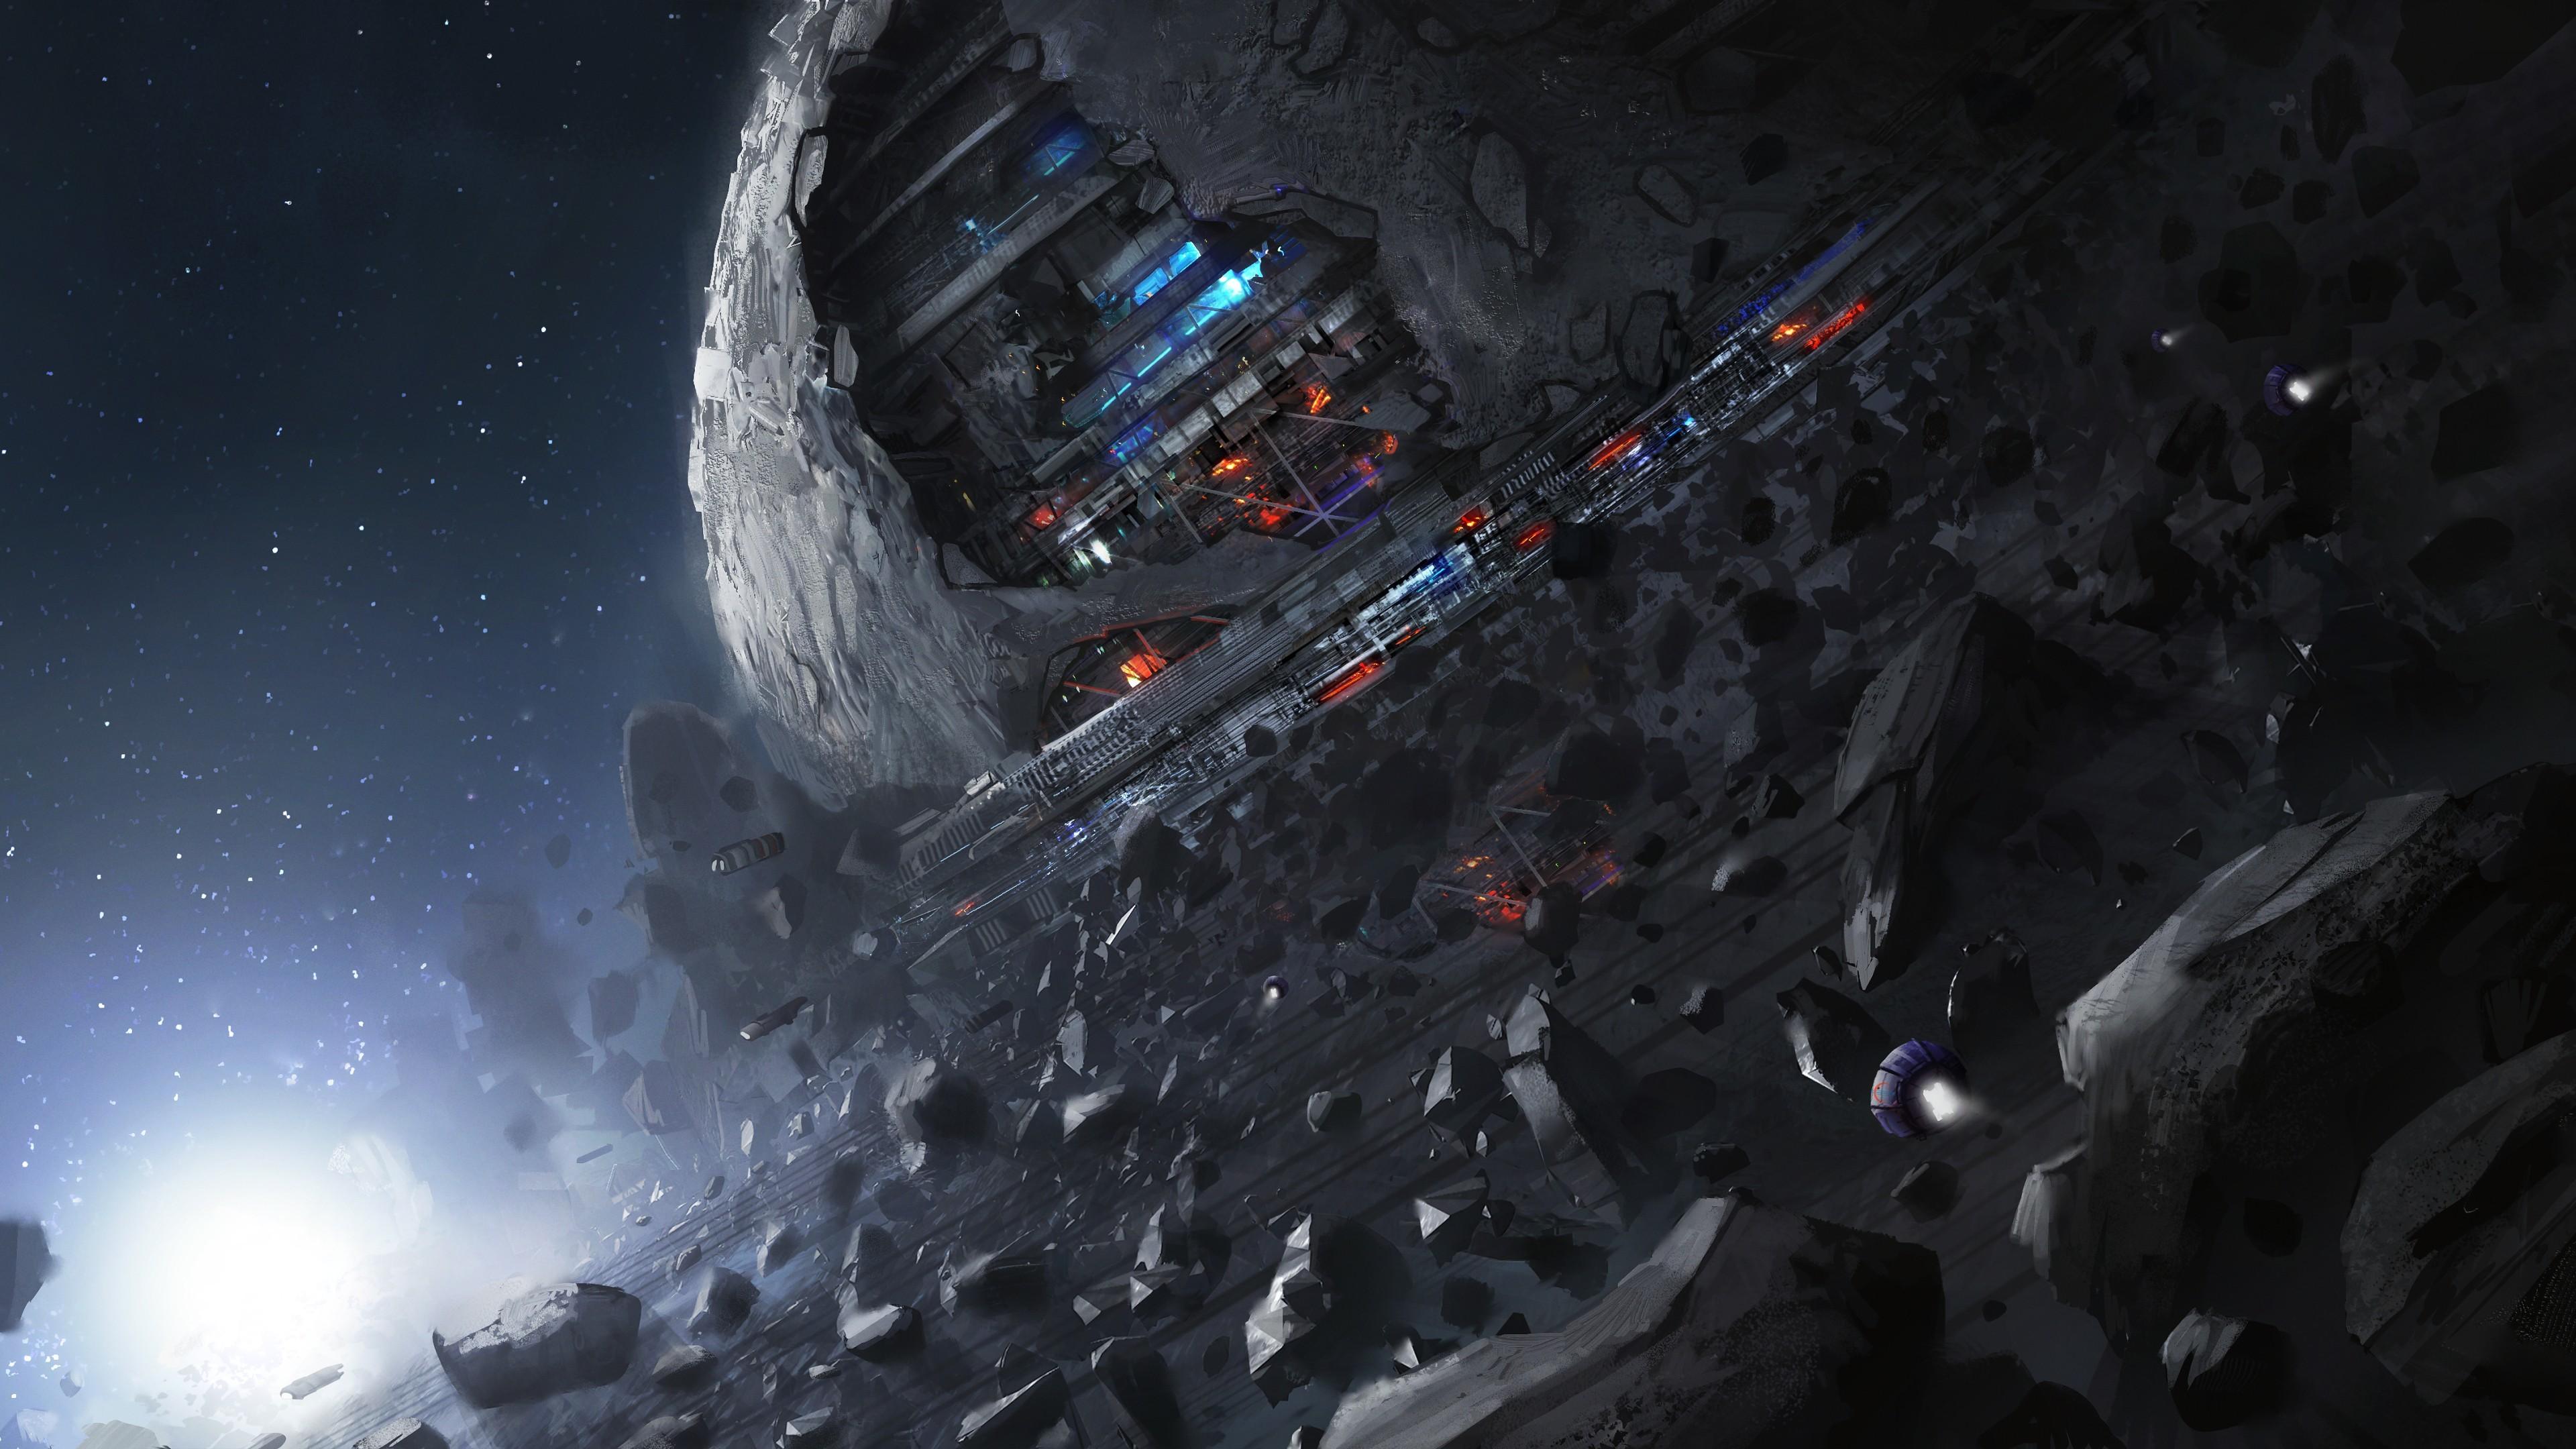 digital art, Fantasy art, Space, Universe, Rock, Moon, Planet, Stars,  Spacestation, Building, Science fiction, Futuristic Wallpapers HD / Desktop  and Mobile …